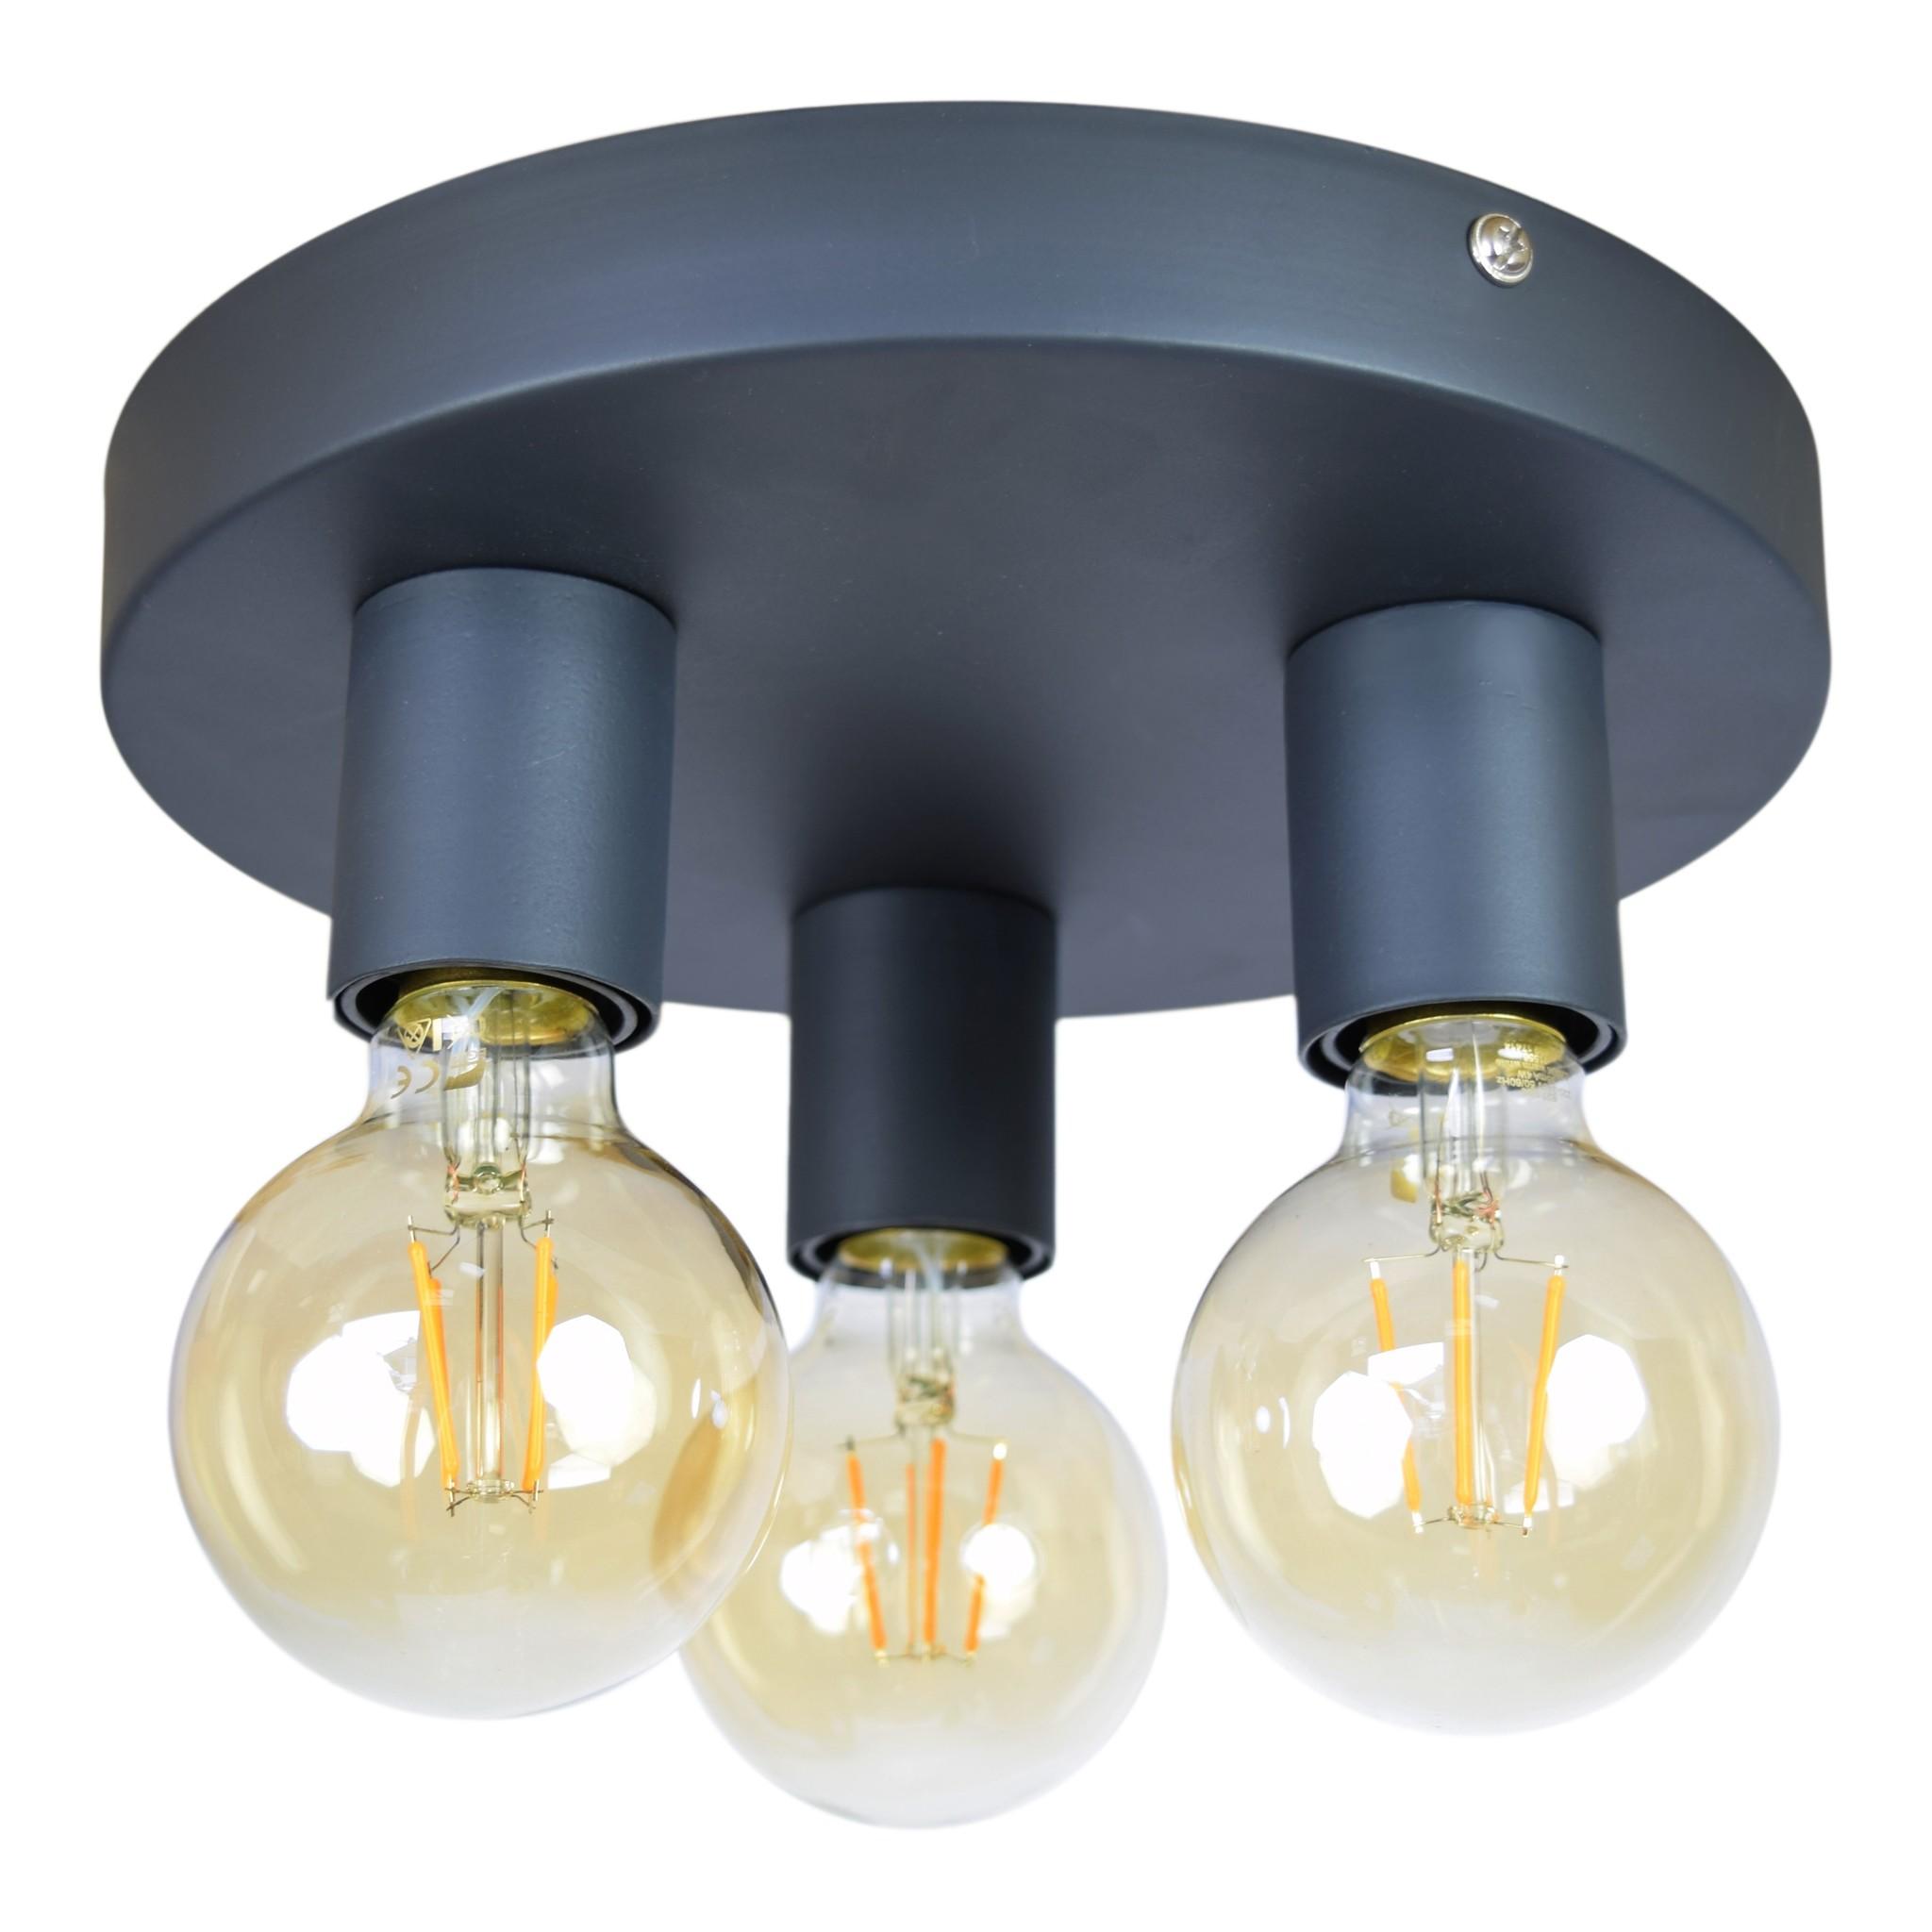 Urban Interiors Urban Interiors Plafondlamp Triple ø25cm. vintage black